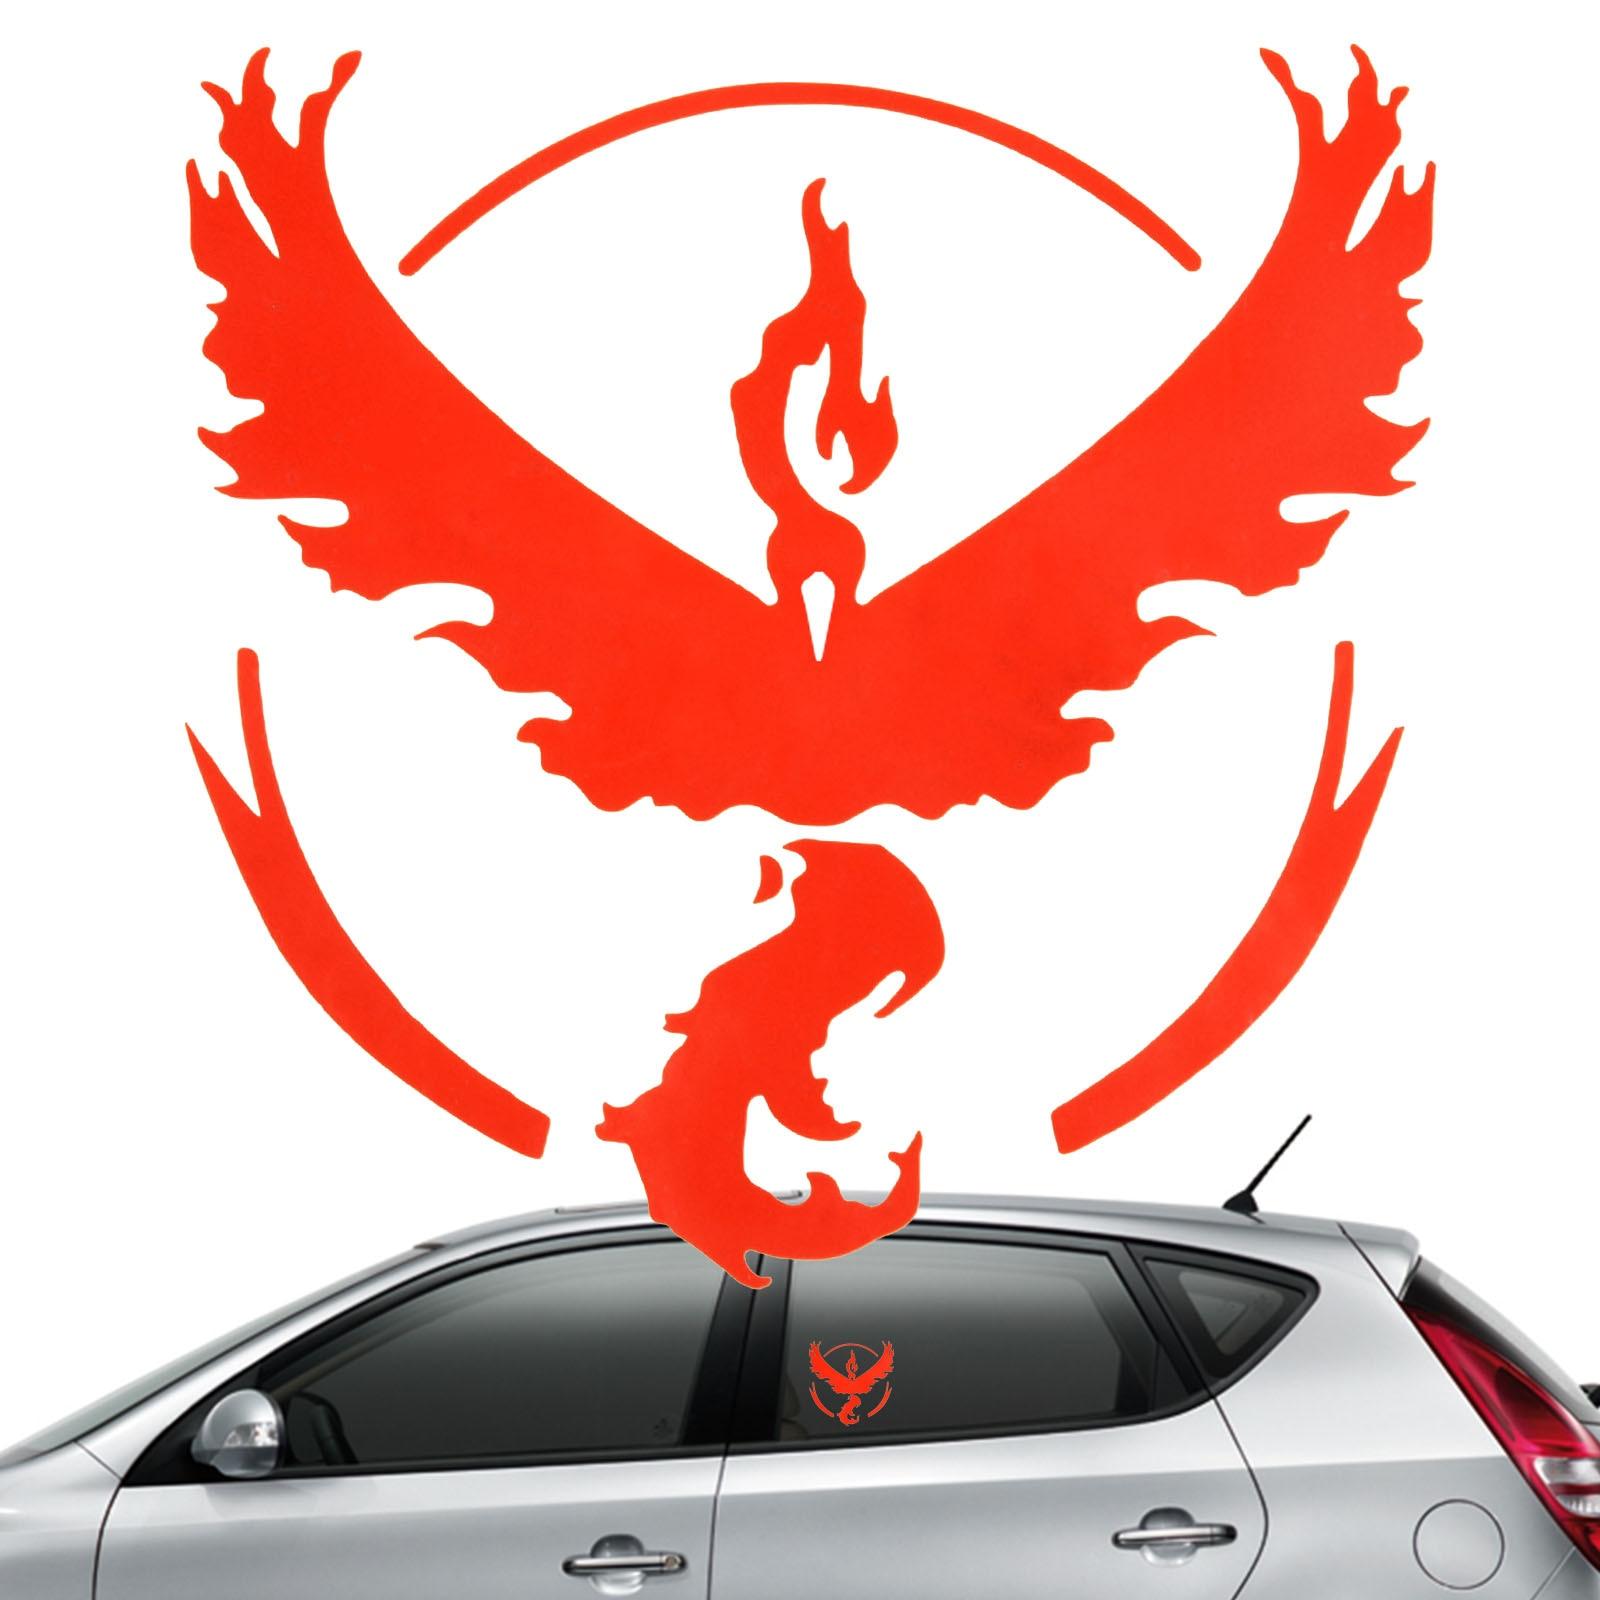 Car sticker design philippines - Pokemon Go Team Valor Pokeball Vinyl Sticker Decal Mystic Instinct Nintendo Wall Stickers Glass Red